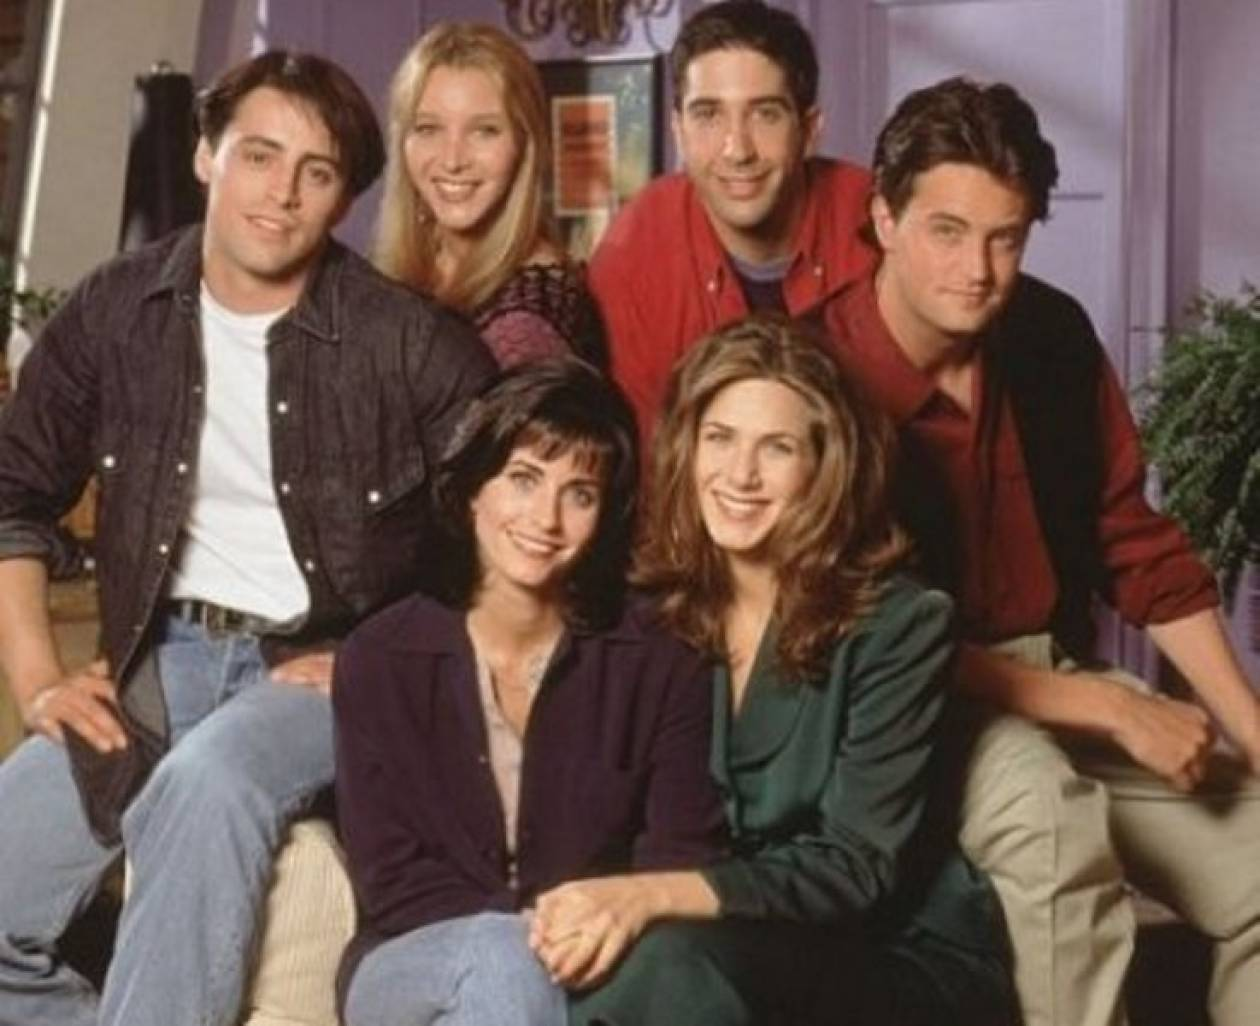 Friends: Ποιο μέλος αρνείται να συμμετάσχει στα νέα επεισόδια;